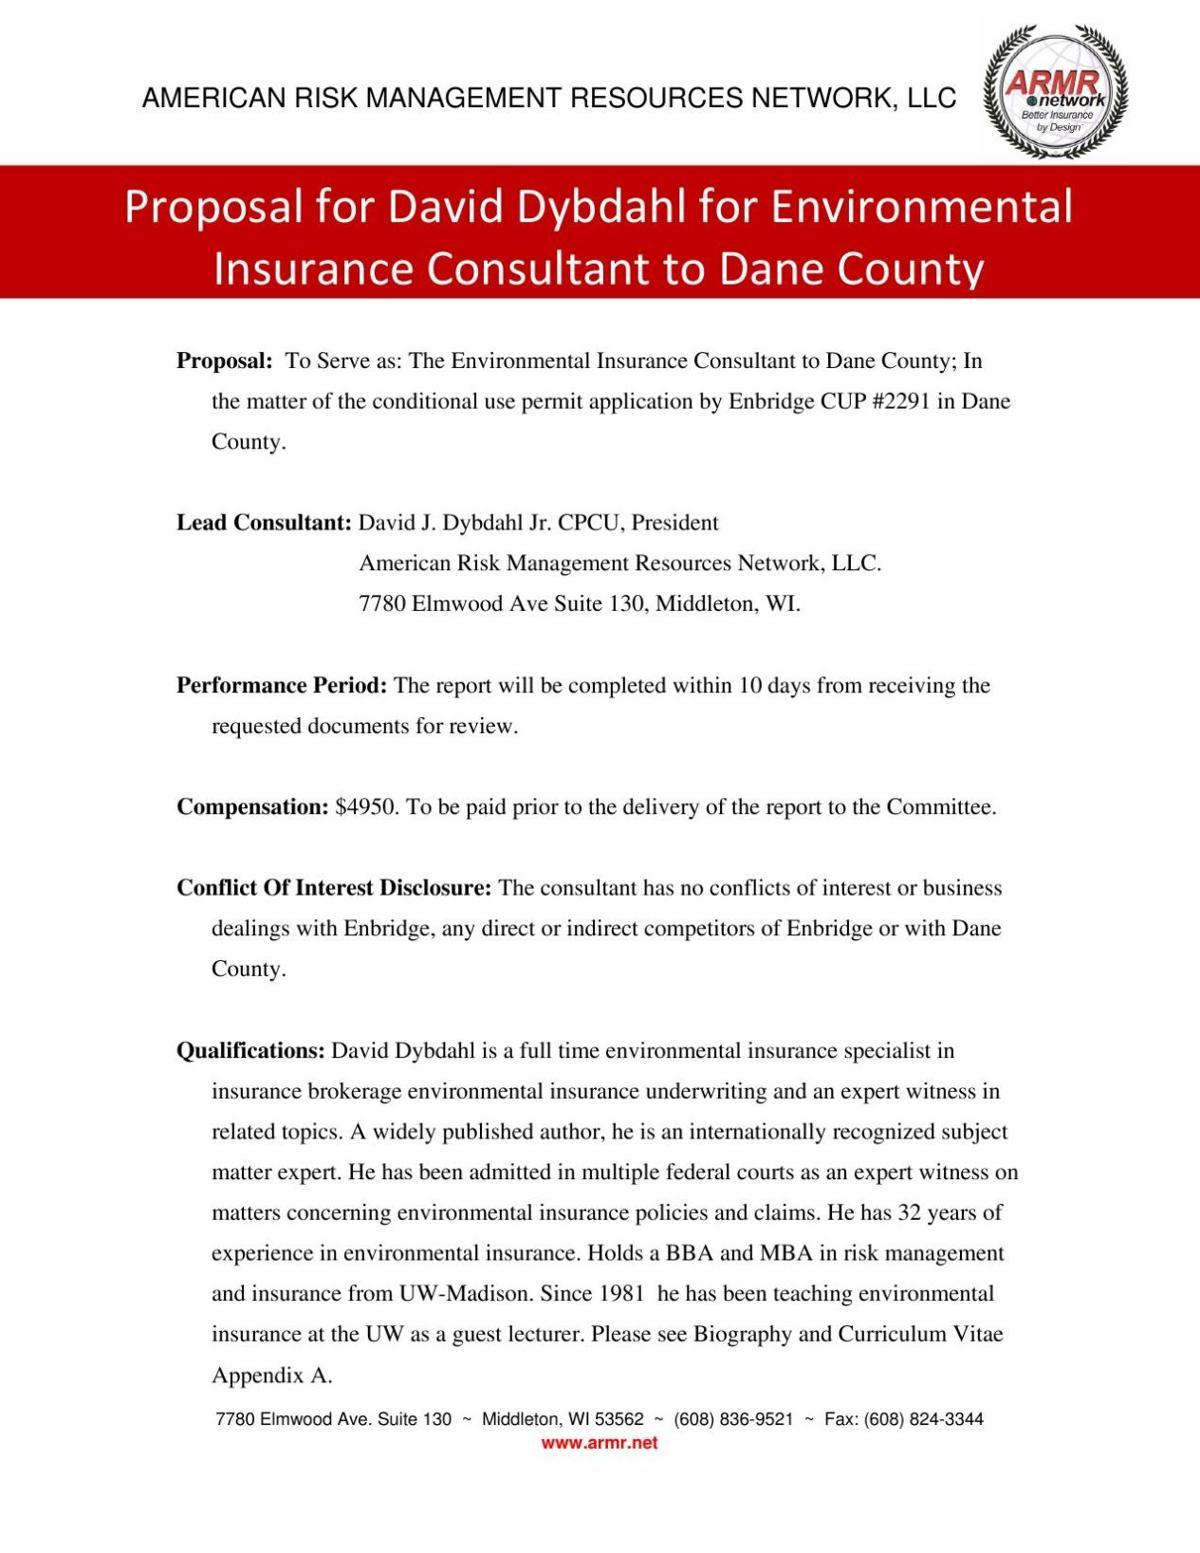 Consultant David J. Dybdahl Jr.